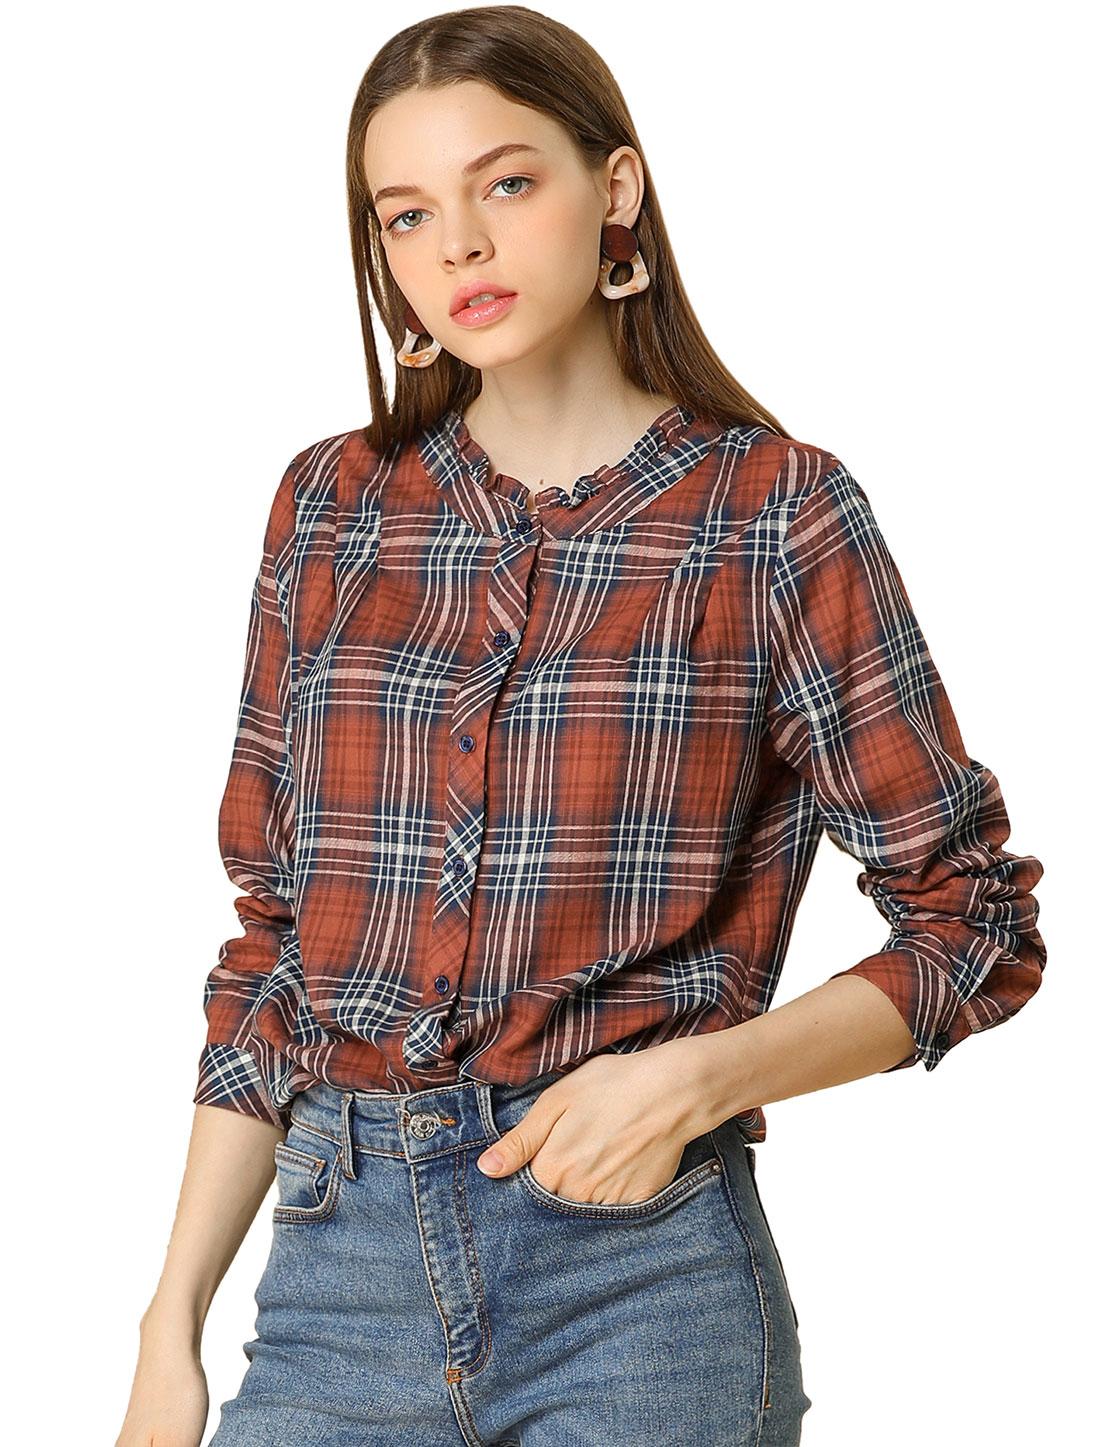 Allegra K Women's Fall Blouse Long Sleeve Ruffle Neck Plaid Shirt Red XS